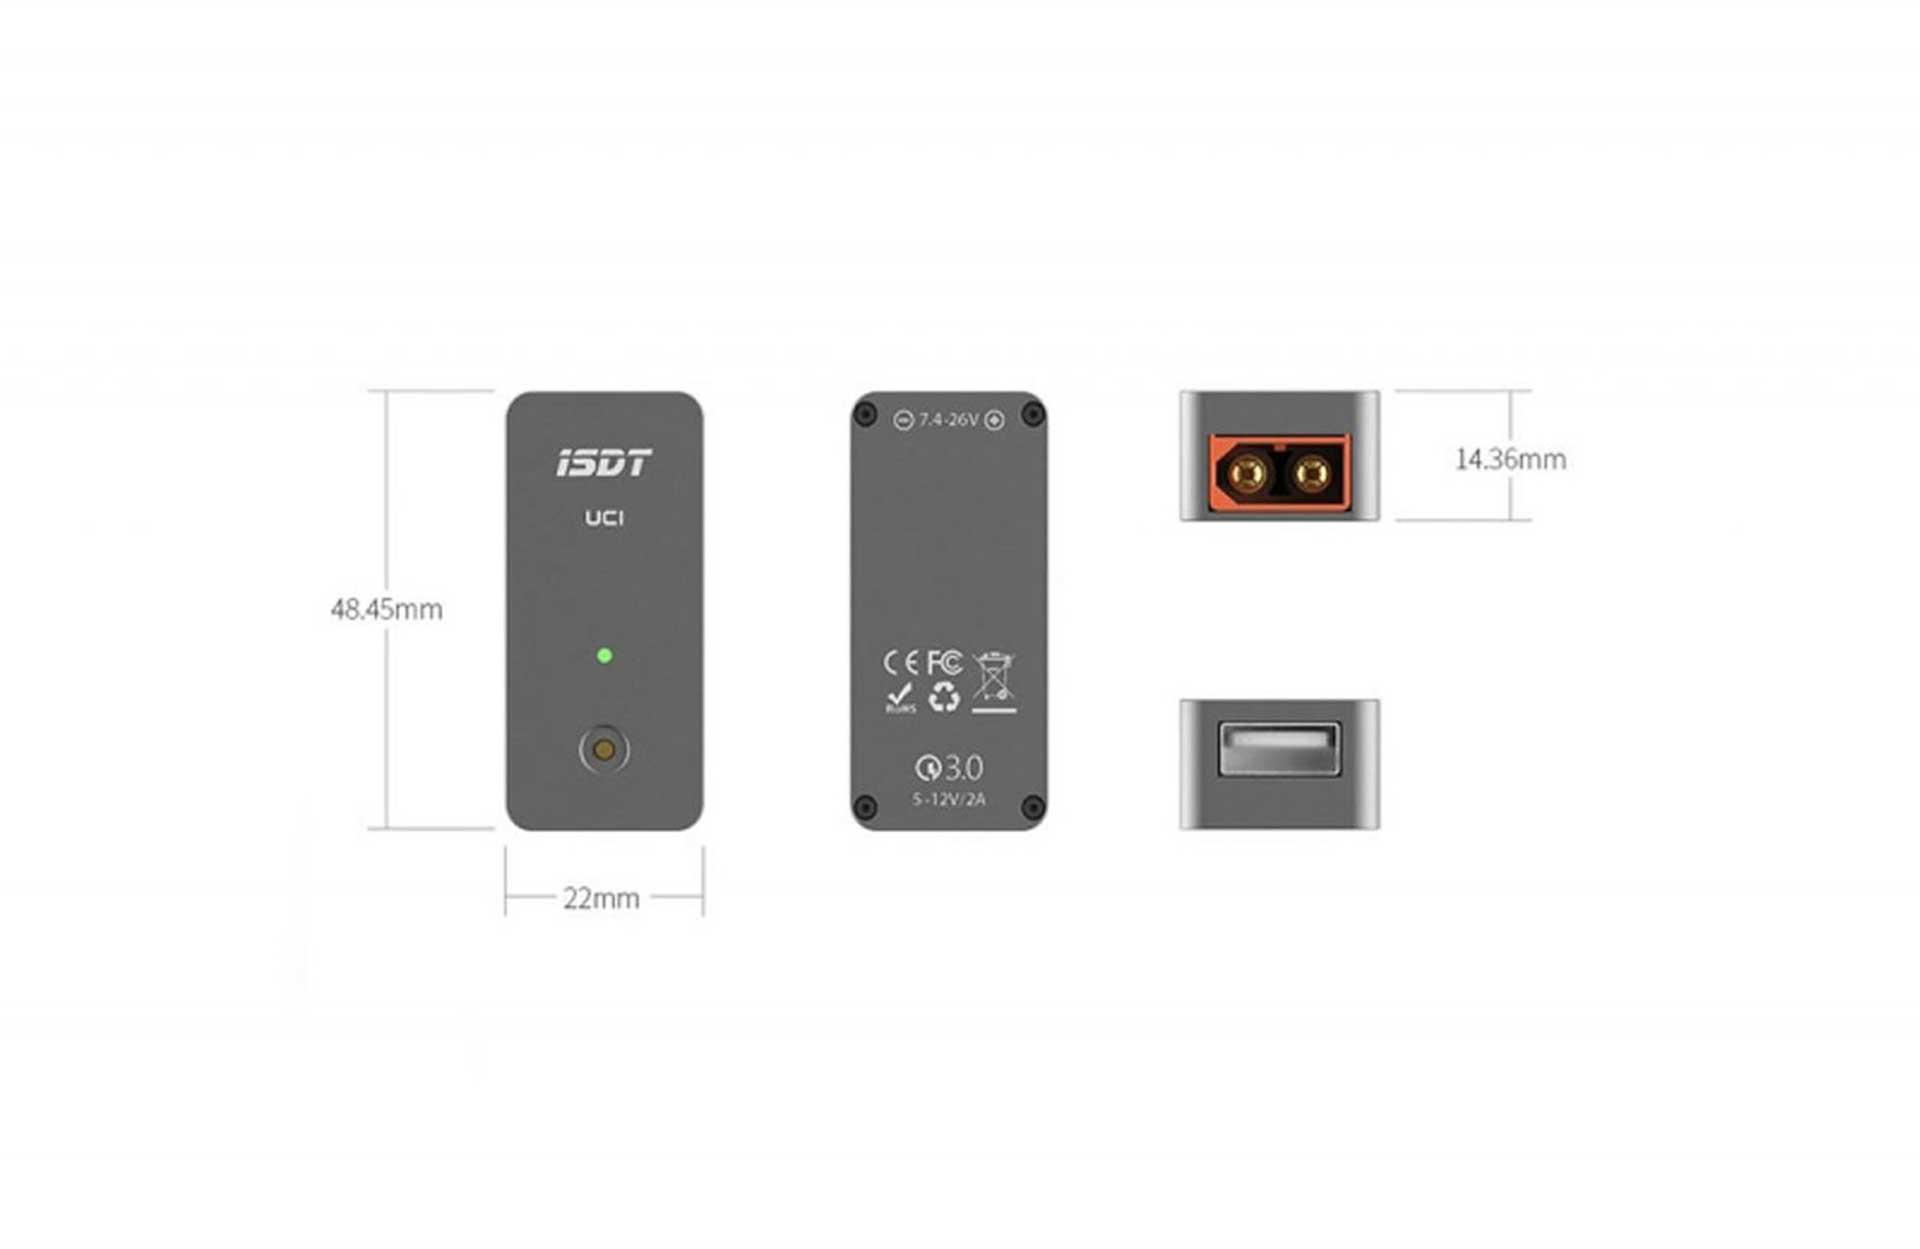 ISDT UC1 USB QUICK CHARGER 2-6S INPUT Ladegerät